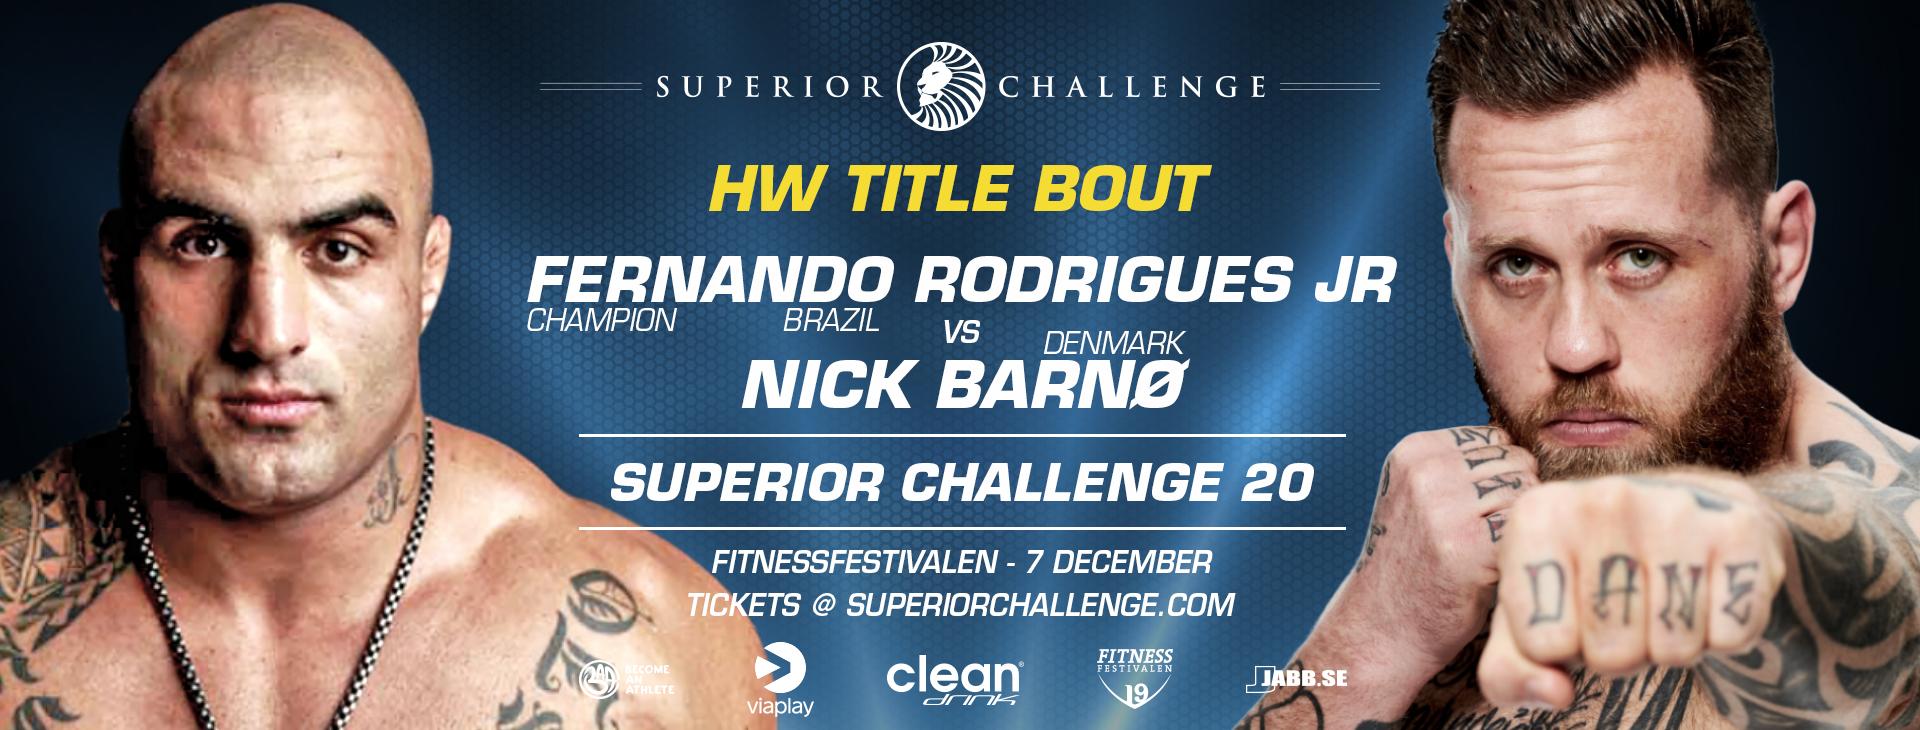 Fernando Rodrigues Jr vs Nick Barno at Superior Challenge 20 Fitnessfestivalen